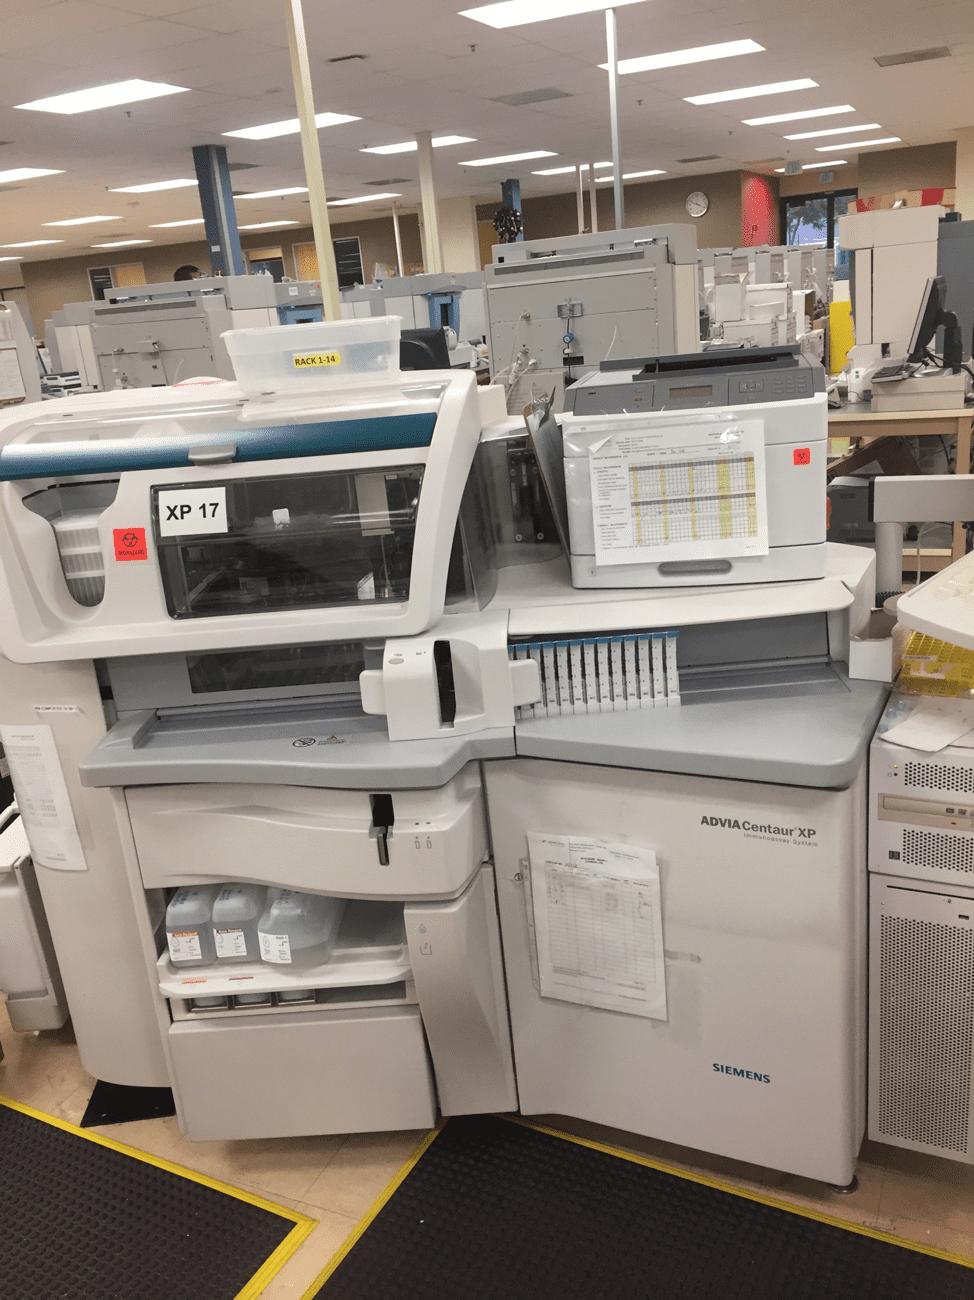 Siemens ADVIA Centaur XP immunoassay